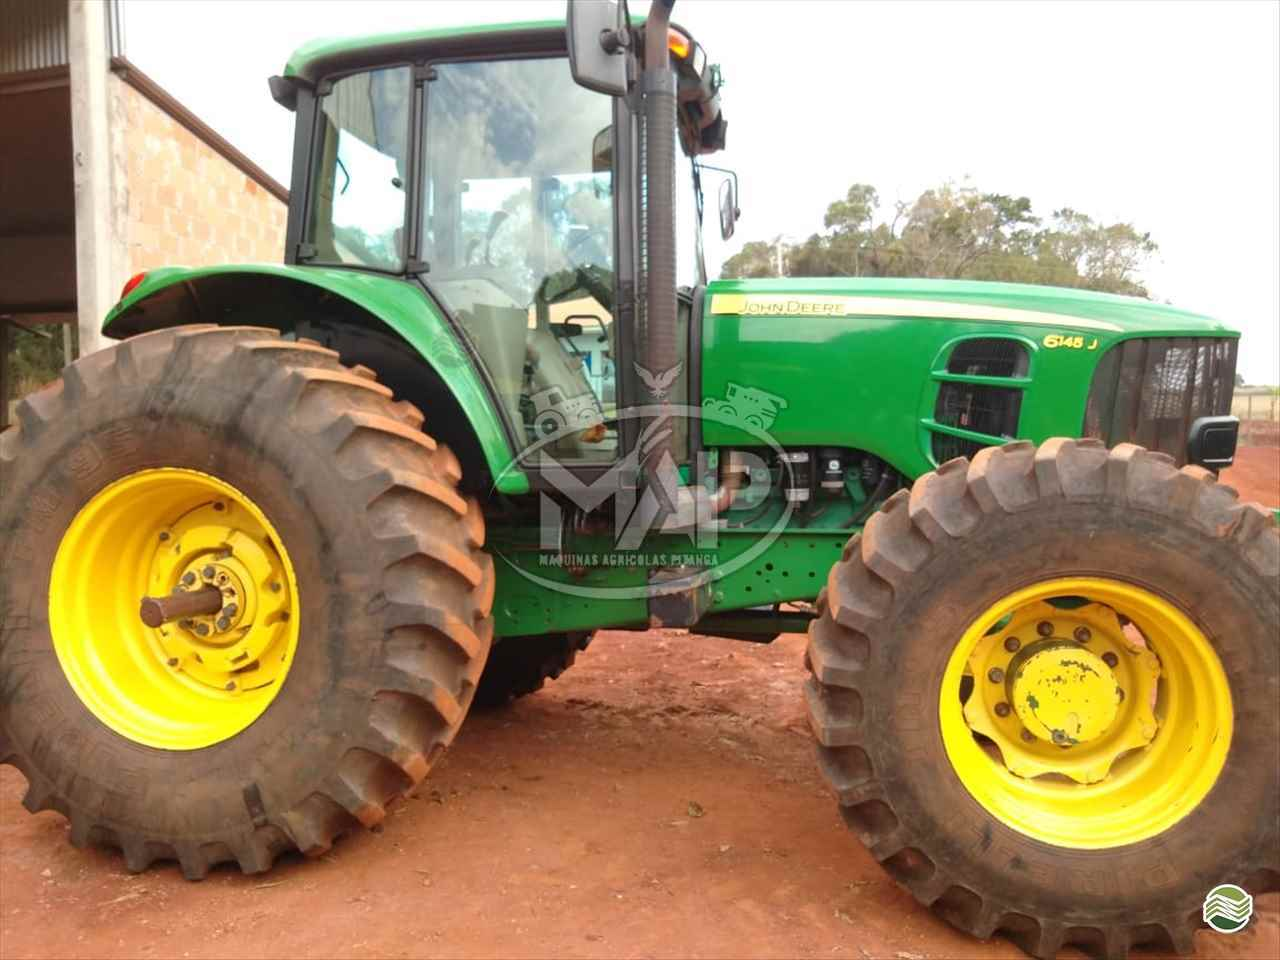 TRATOR JOHN DEERE JOHN DEERE 6145 Tração 4x4 Máquinas Agrícolas Pitanga PITANGA PARANÁ PR